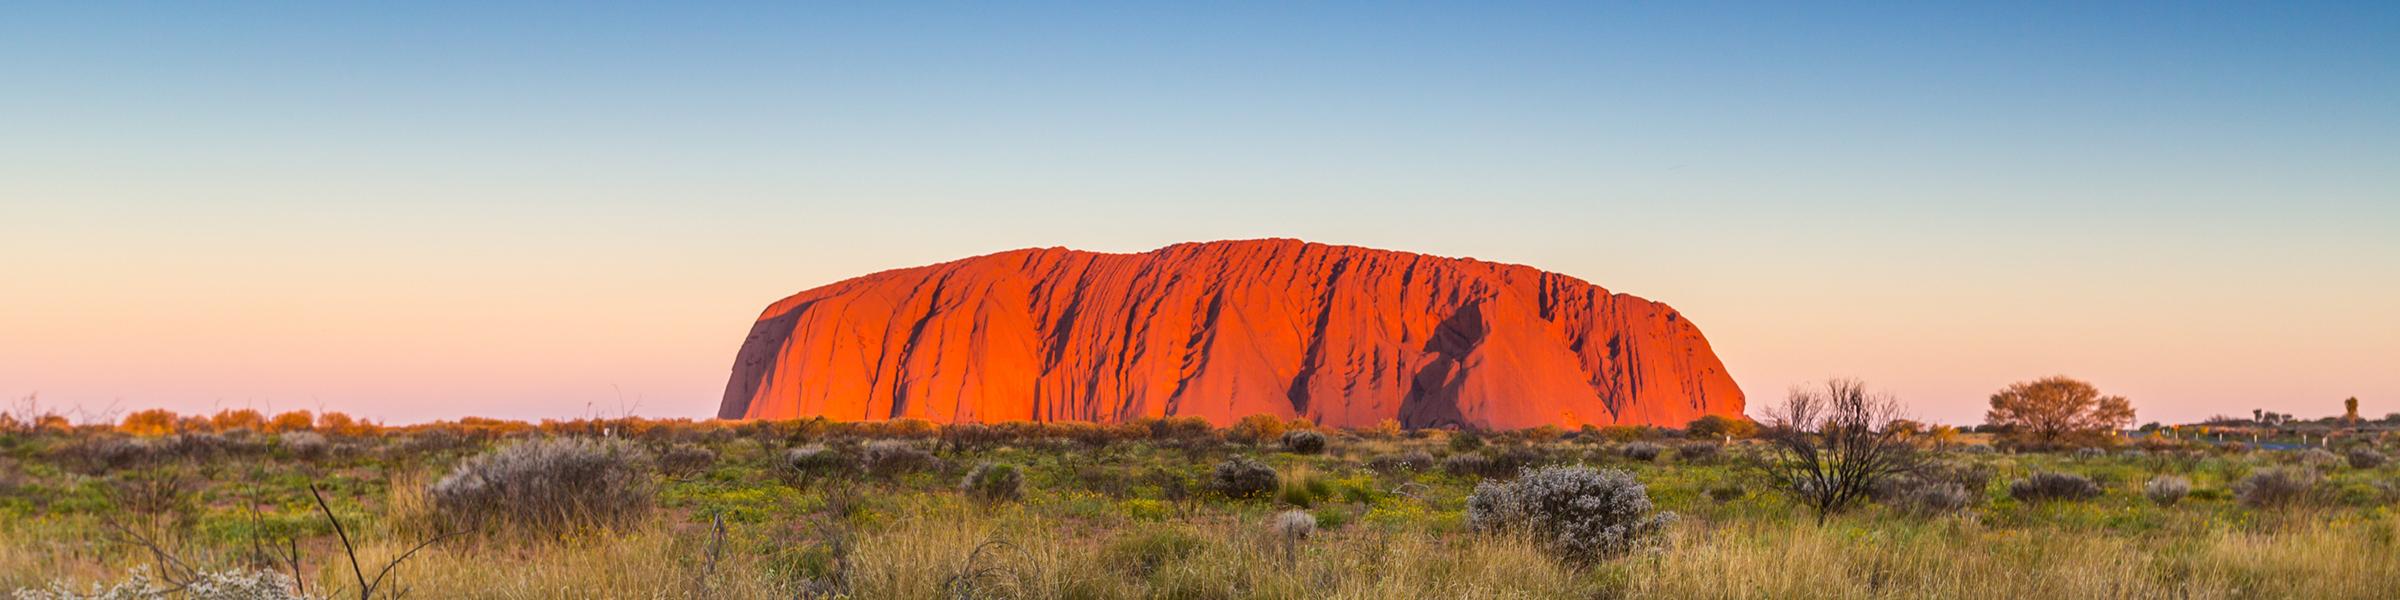 Australia Uluru Kata Tjuta National Park Ayers Rock